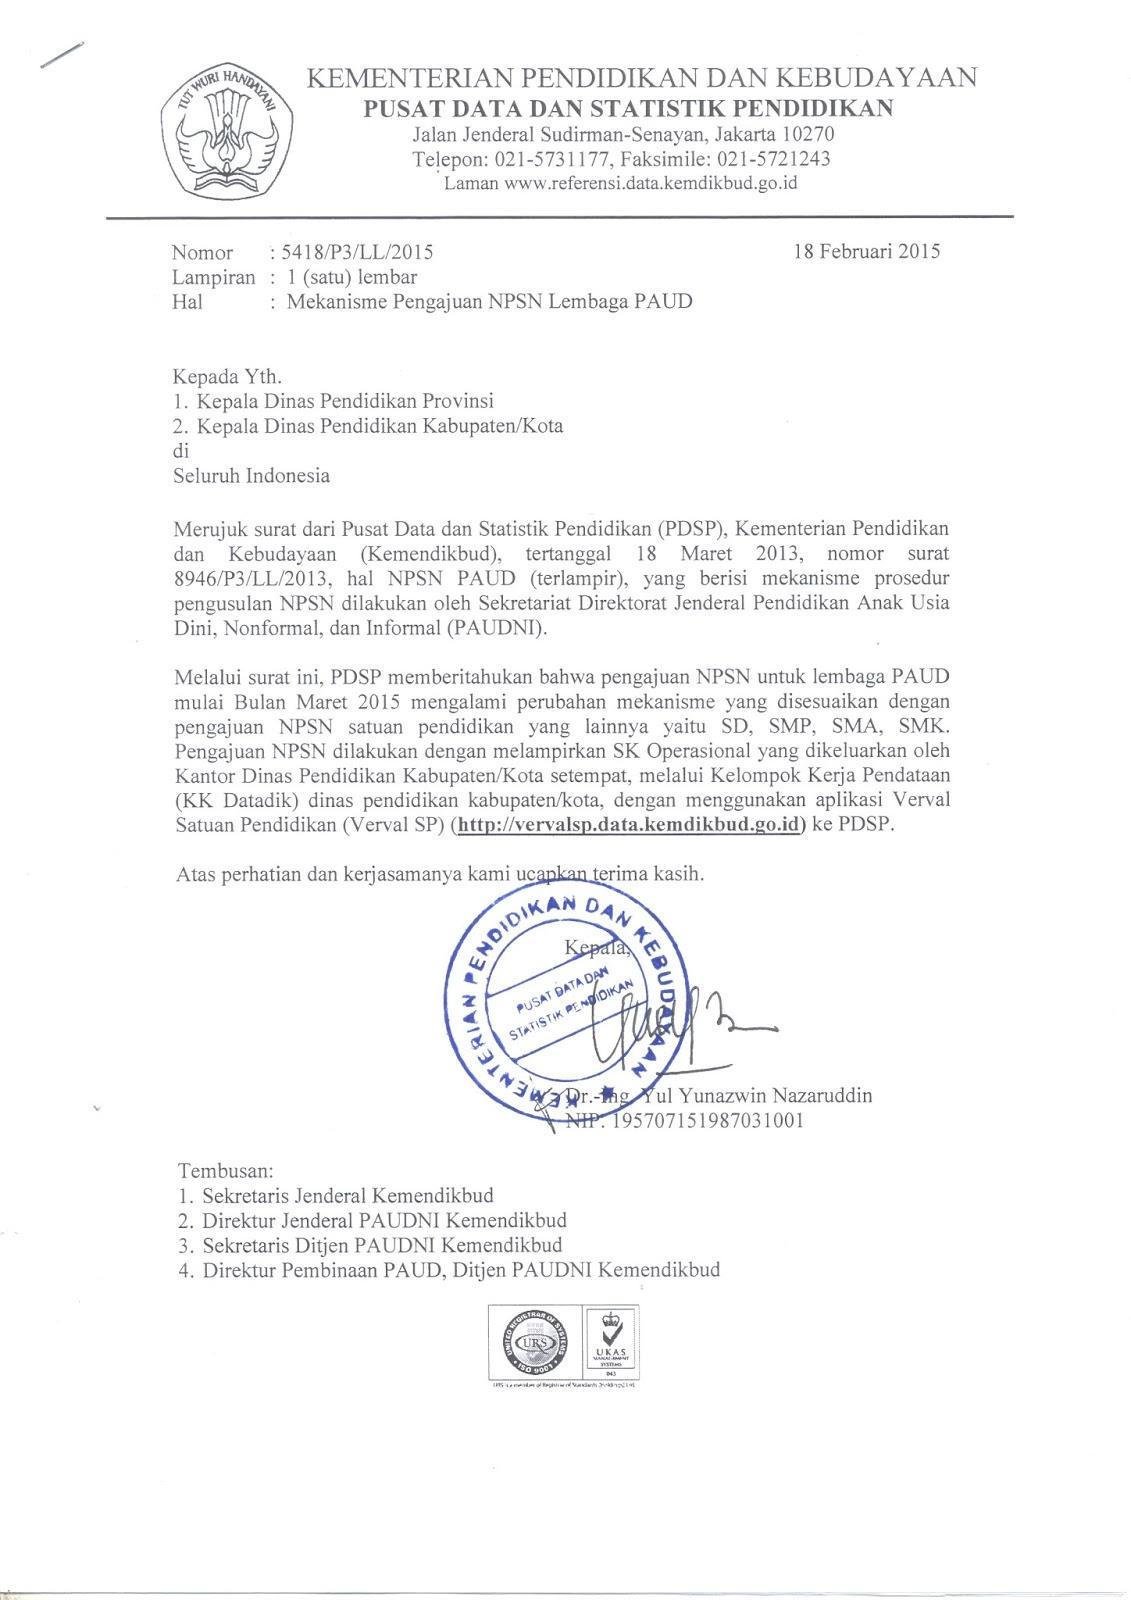 Download Buku Mekanisme Pengajuan Npsn Lembaga Paud Tahun 2015 Wiki Edukasi